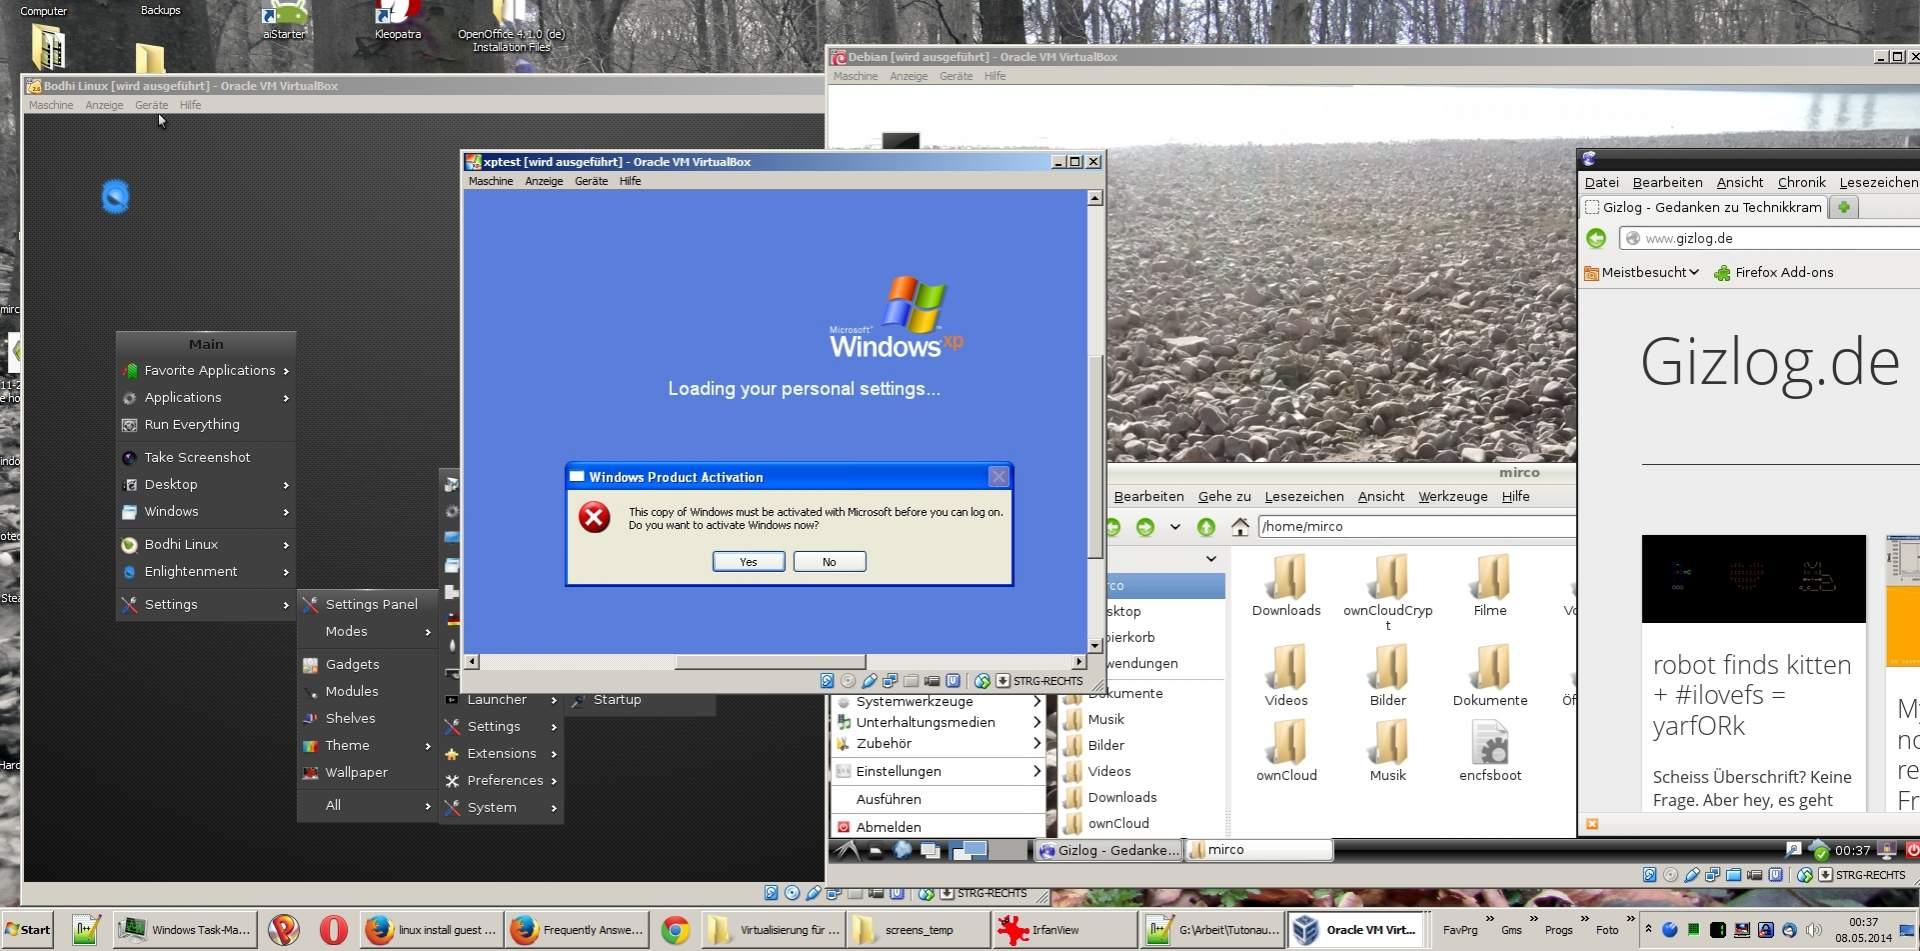 🐈 Download windows xp service pack 3 iso 32 bit torrent | Windows